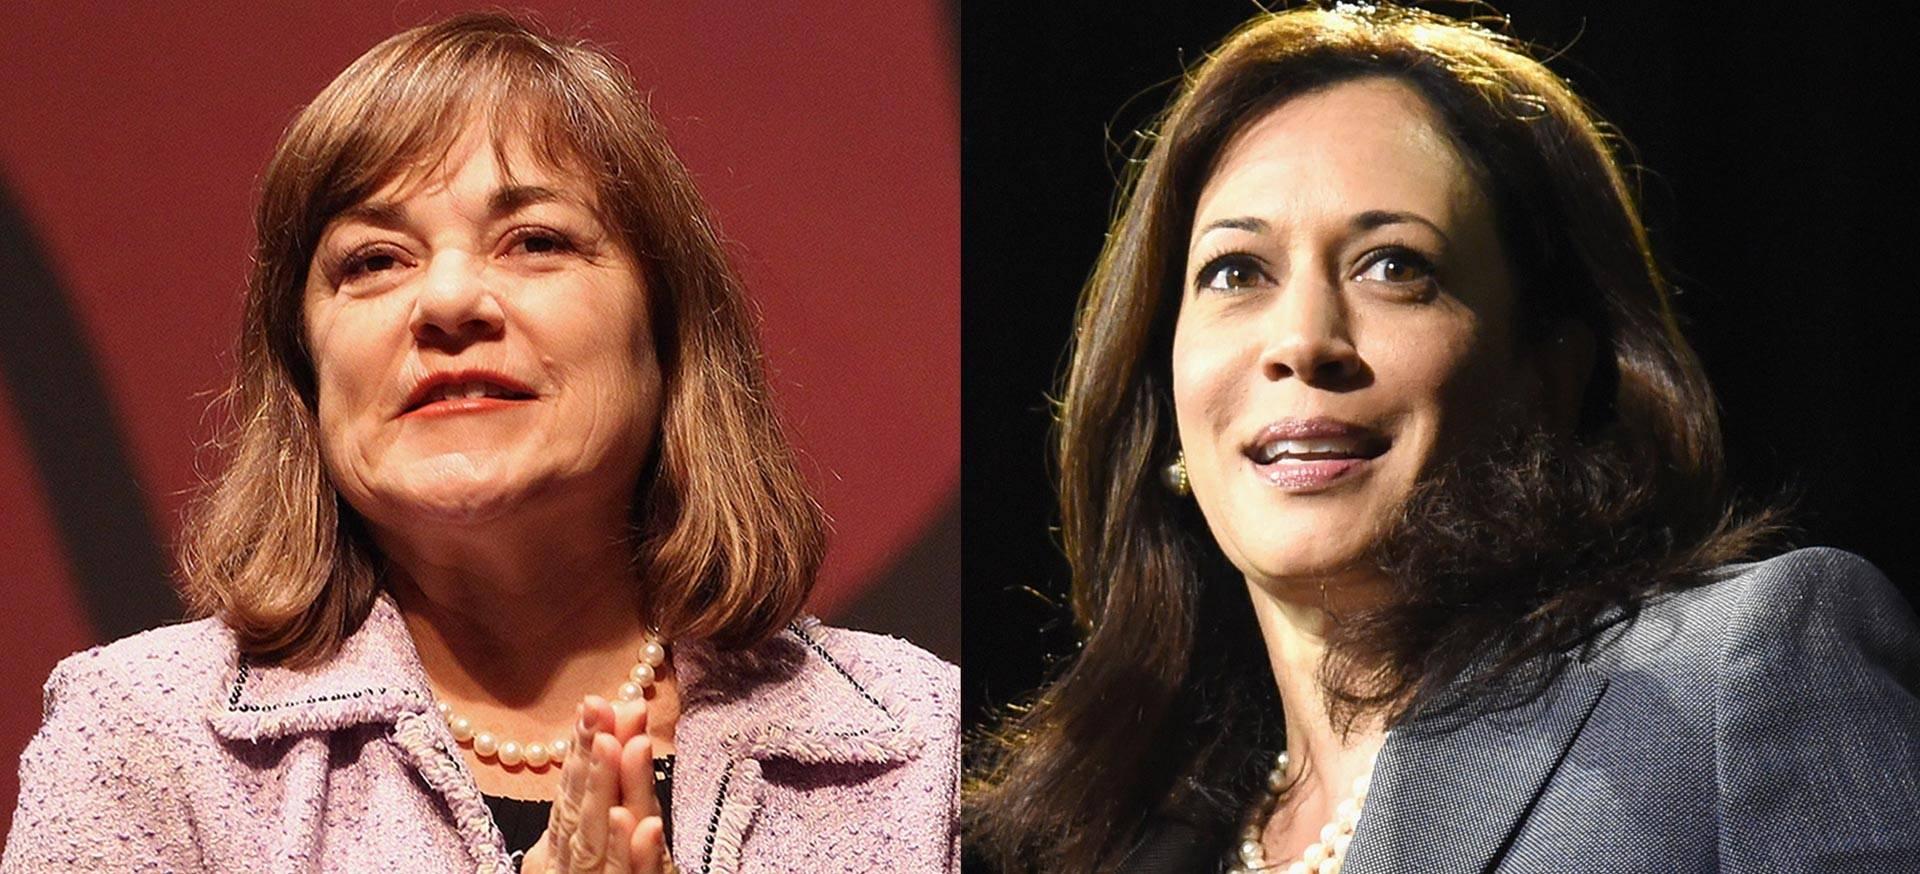 U.S. Senate candidates Rep. Loretta Sanchez (L) and Attorney General Kamala Harris.